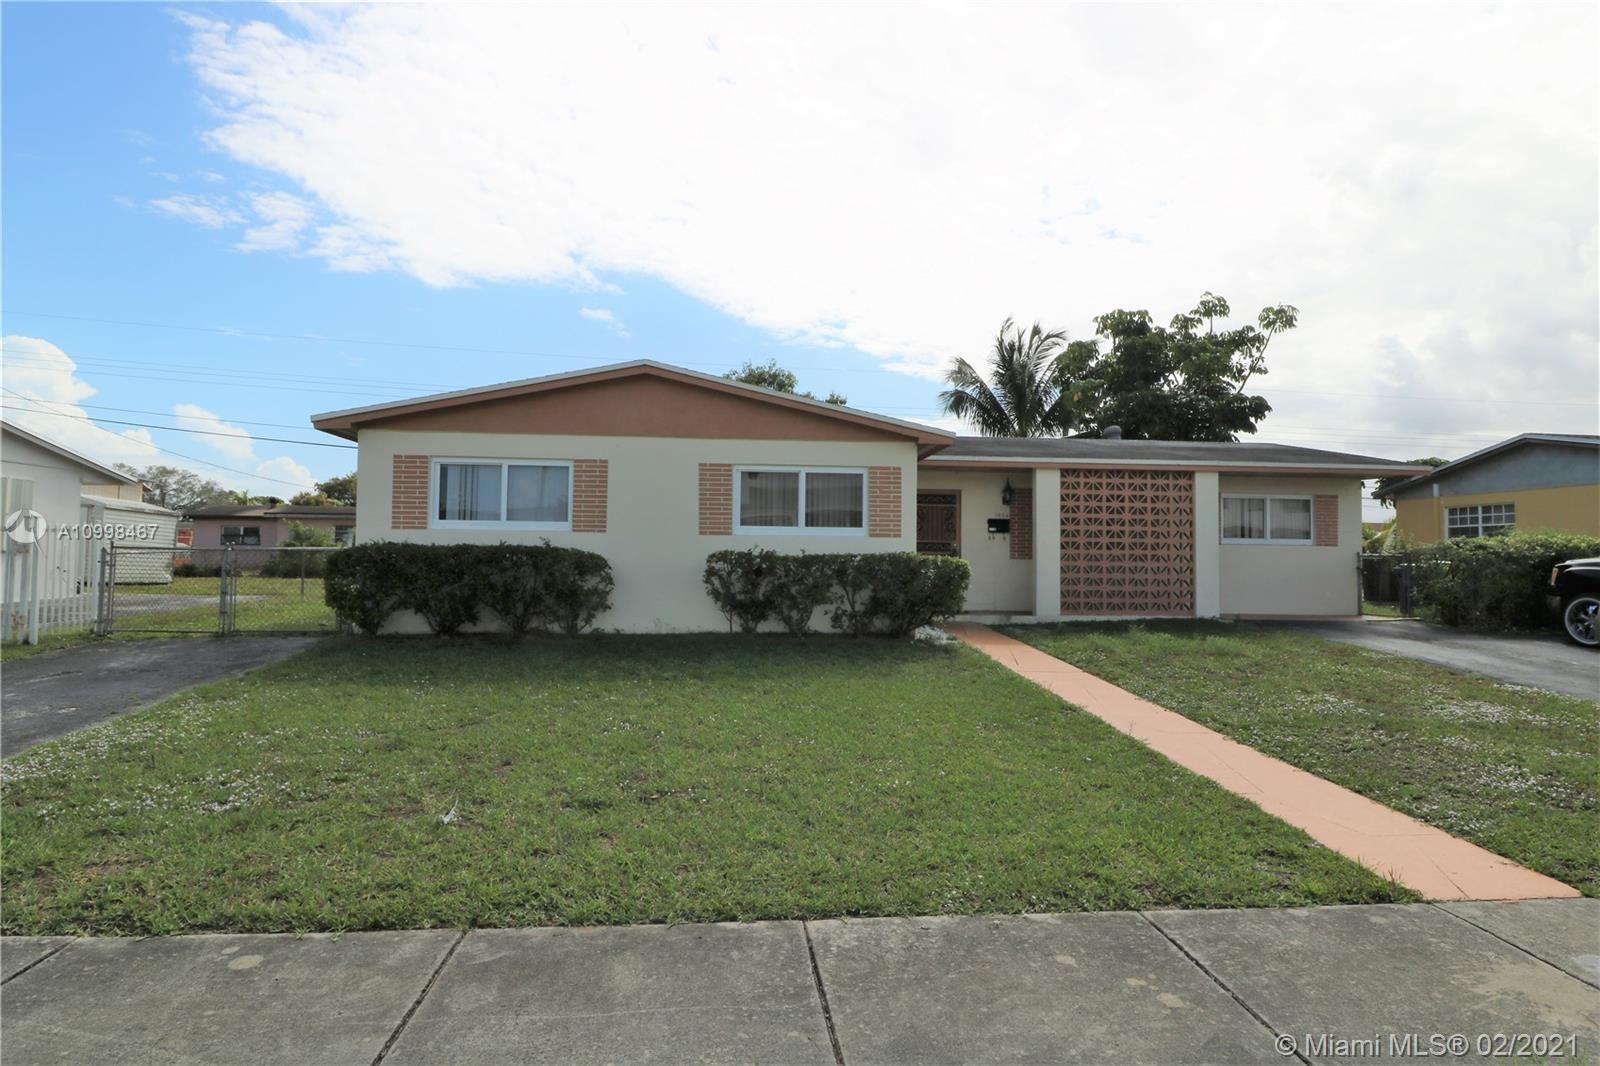 1432 NW 196th St, Miami Gardens, FL 33169 - #: A10998467